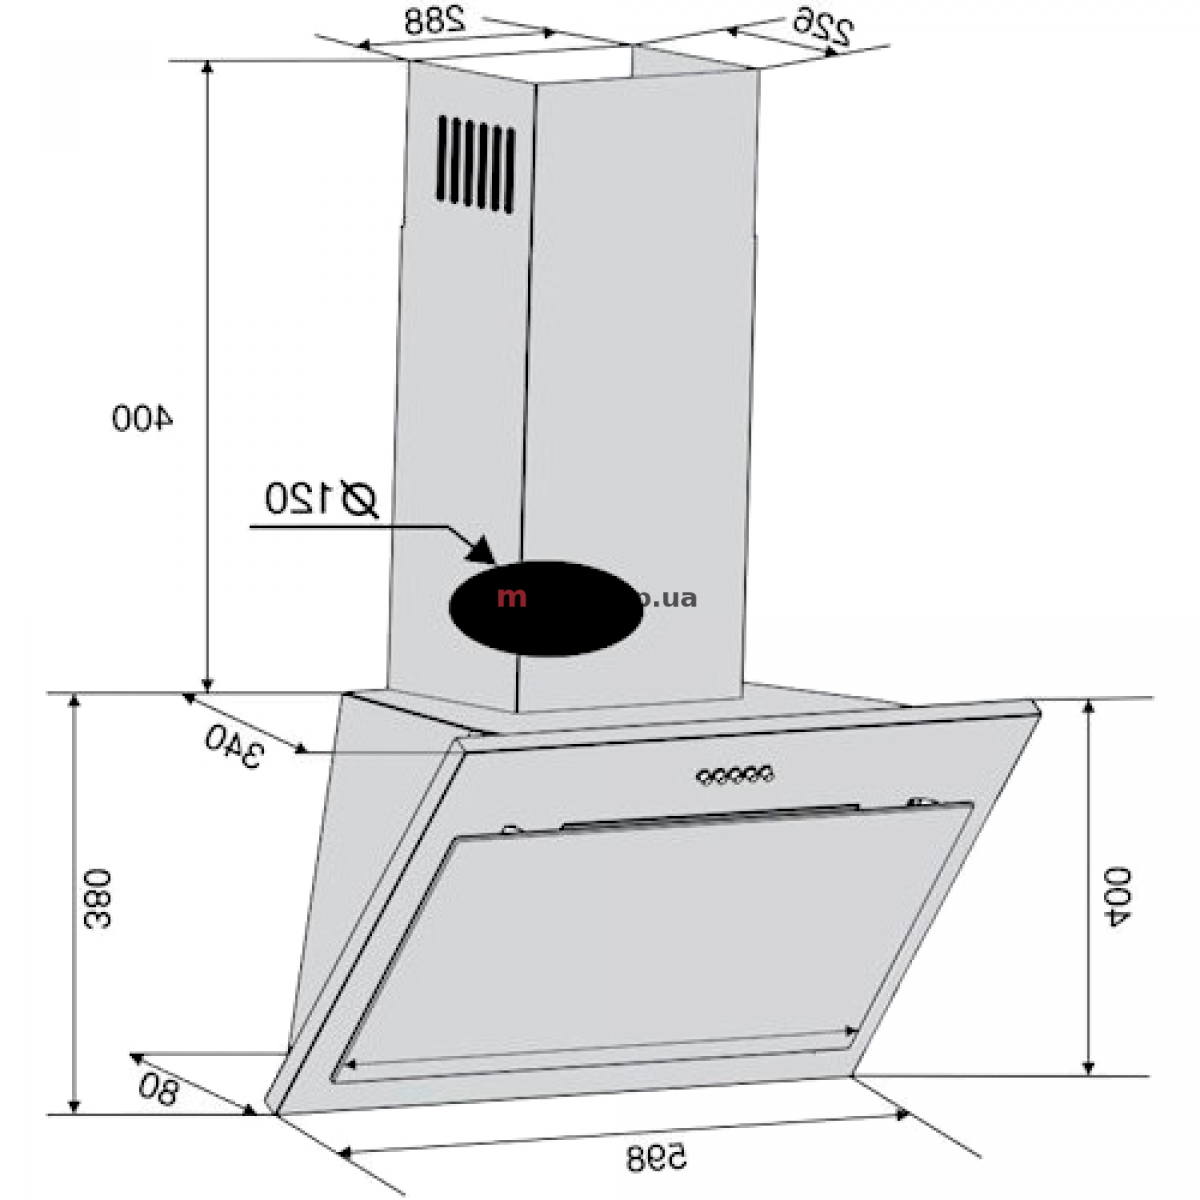 Вытяжка VENTOLUX FIORE 60 WH (750) PB белое стекло